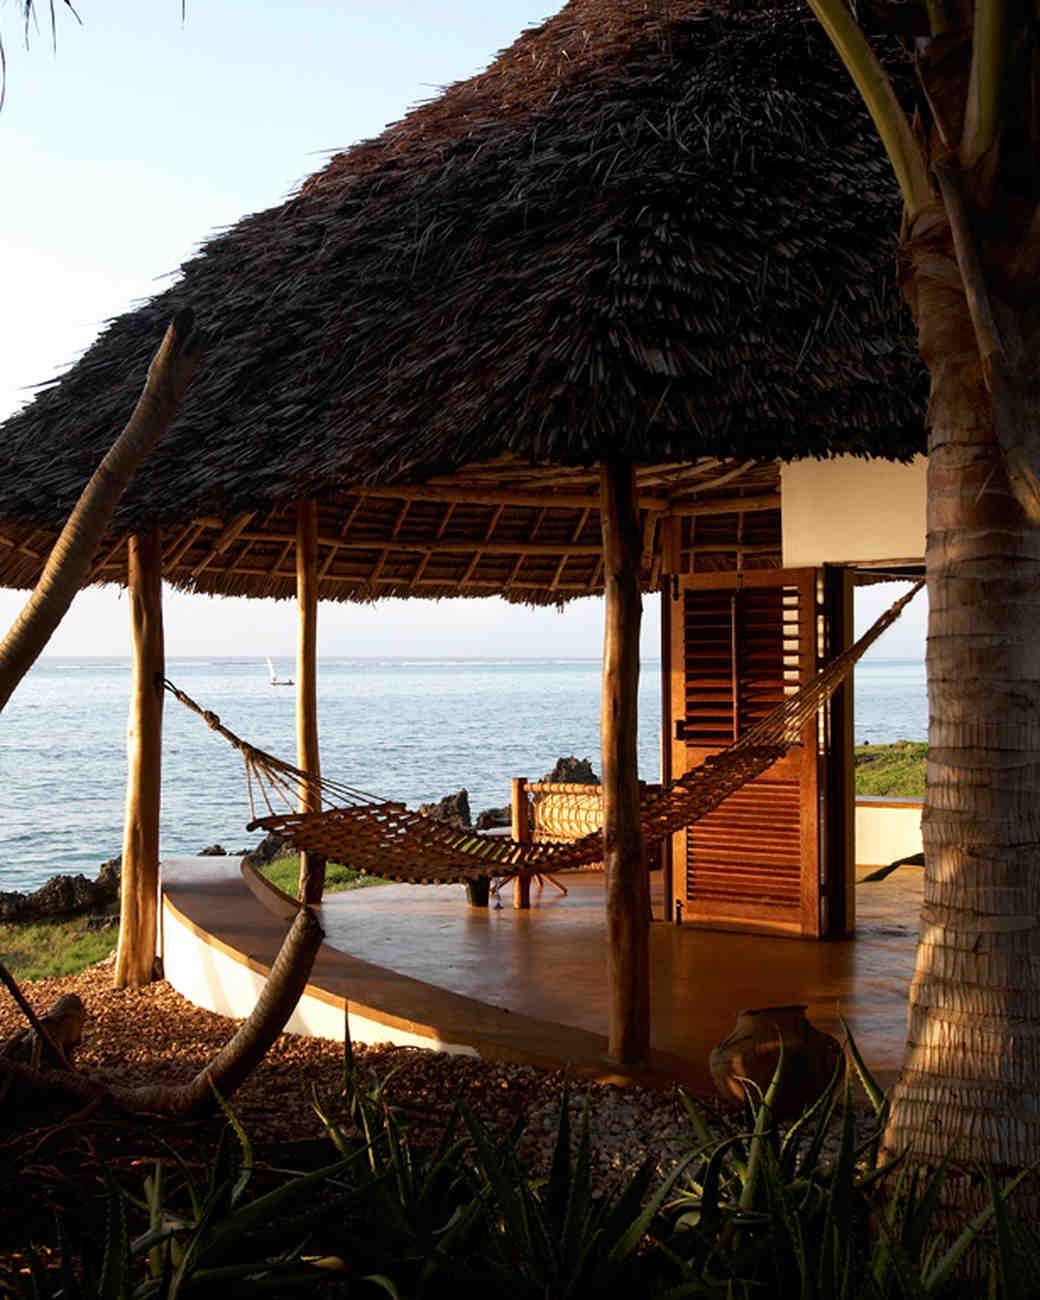 best-beach-honeymoon-spots-matemwe-lodge-exterior-hammock-seaview-1115.jpg